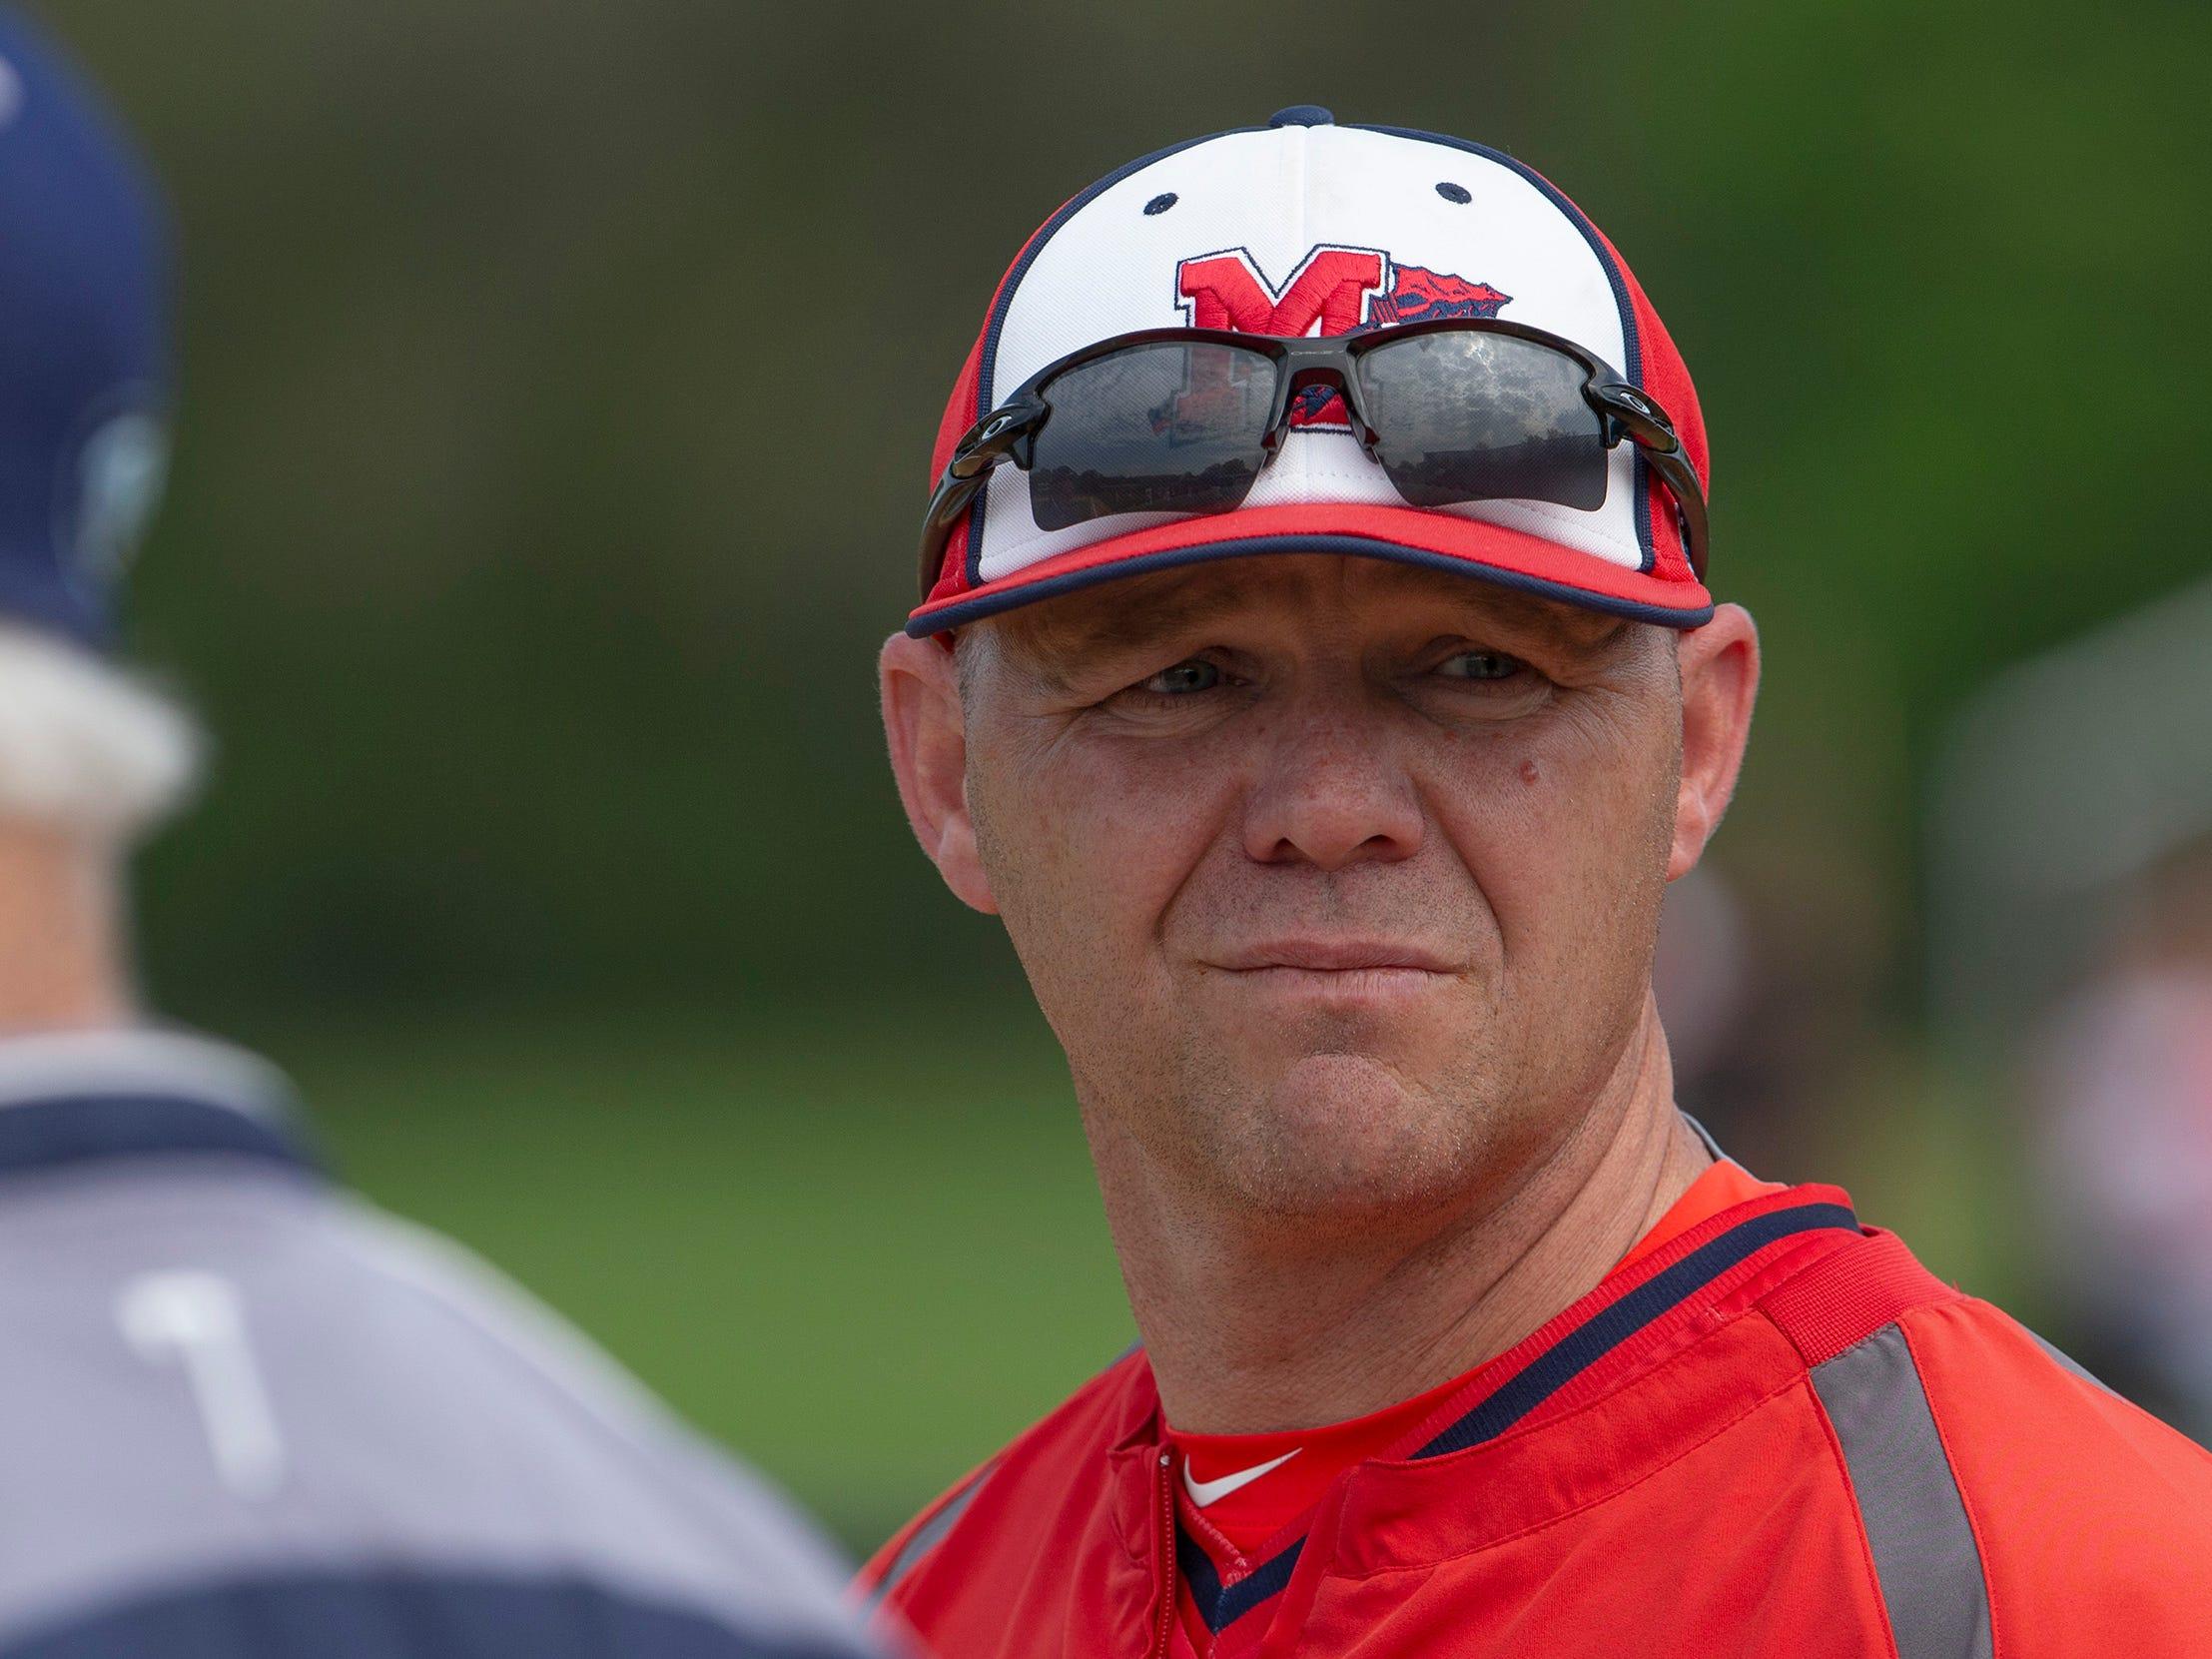 Manalapan Coach Brian Boyce. Manalapan baseball vs Christian Brothers Academy in Middletown NJ. On May 2, 2019.